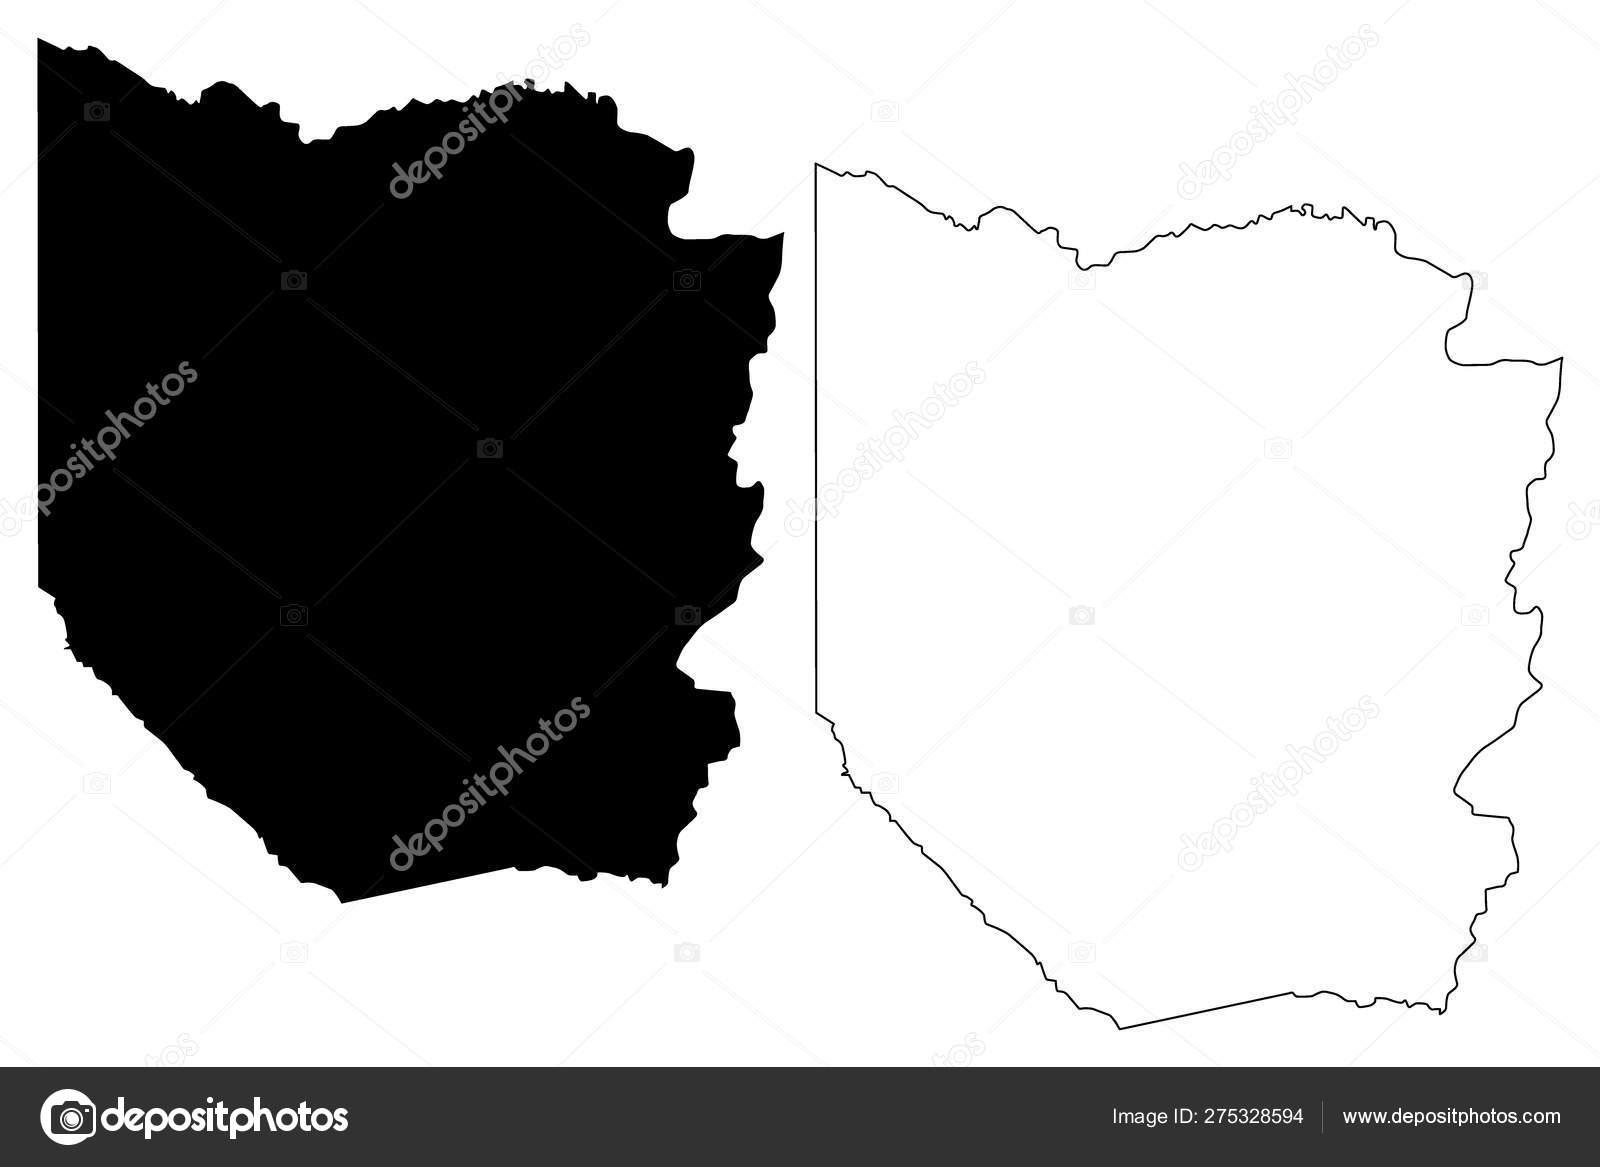 Western Province (Provinces of Zambia, Republic of Zambia ...